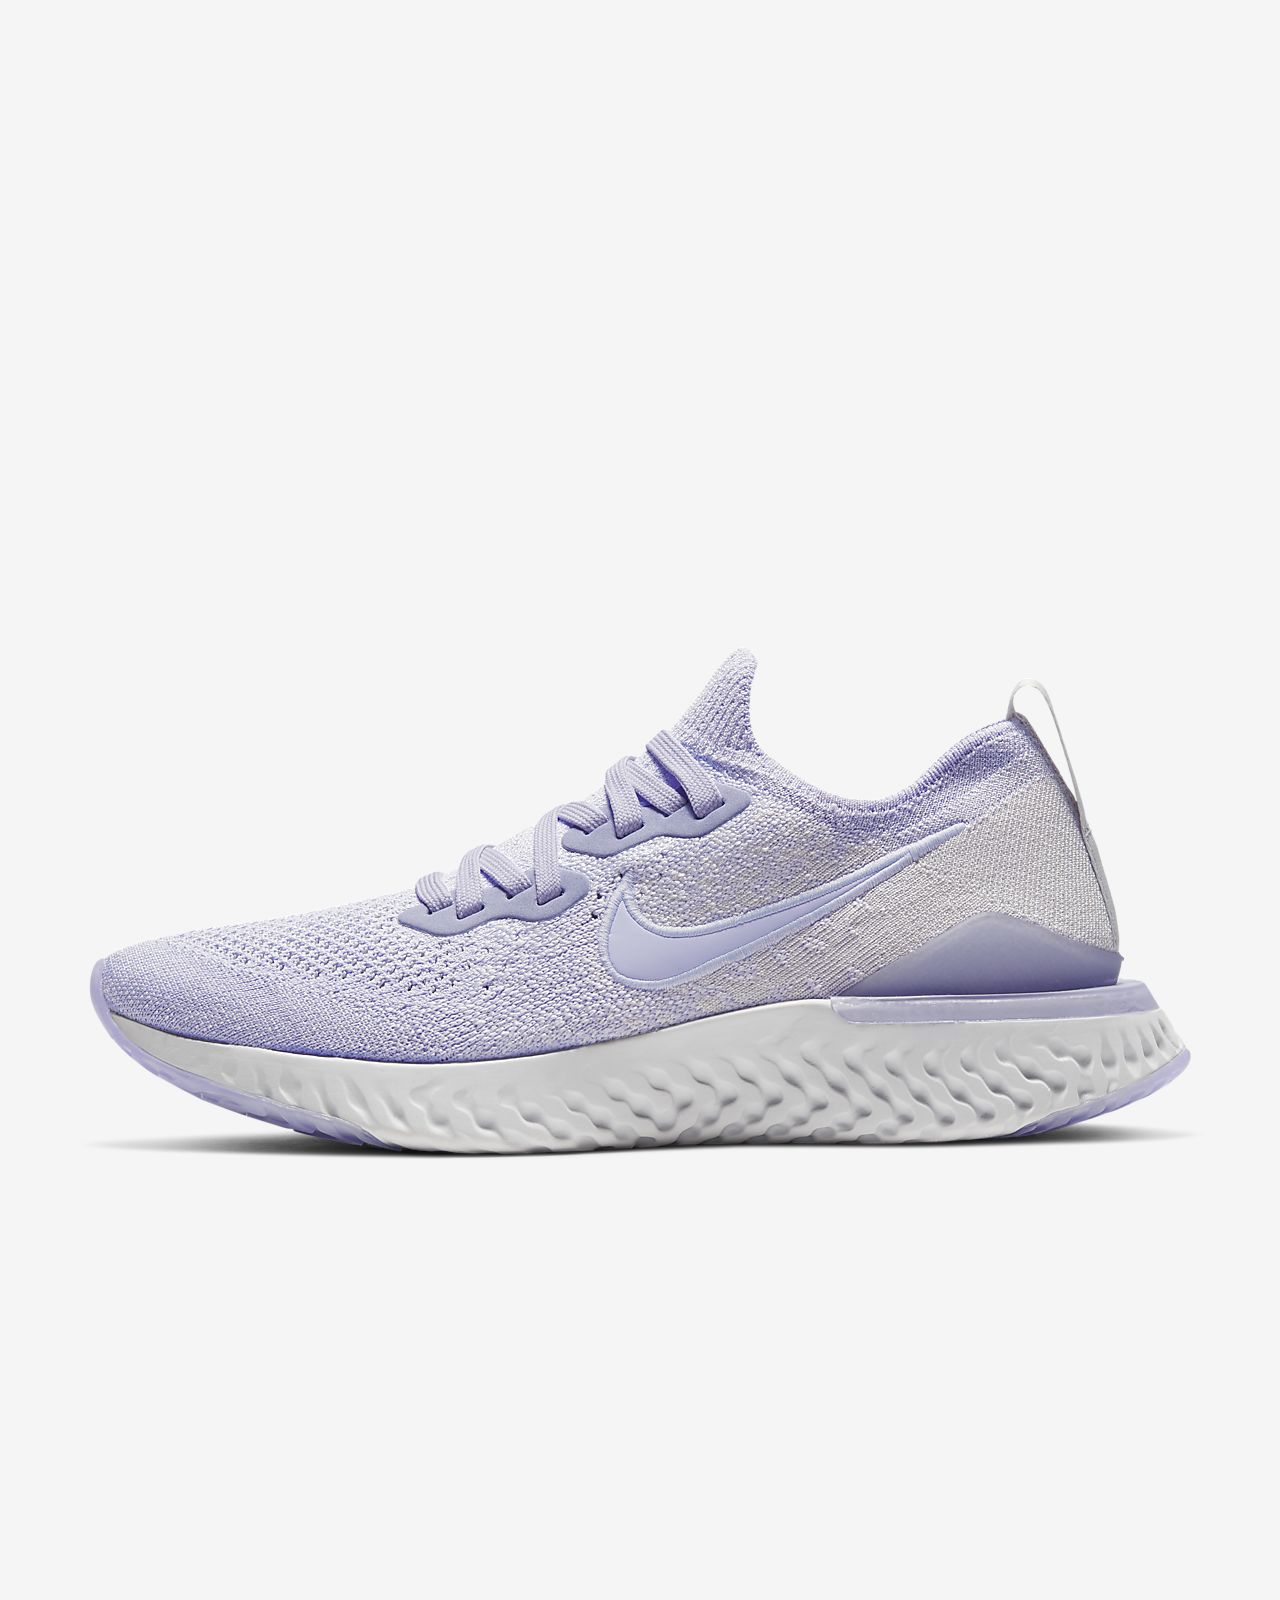 official photos 064cc 4c1a6 Nike Epic React Flyknit 2 Women's Running Shoe